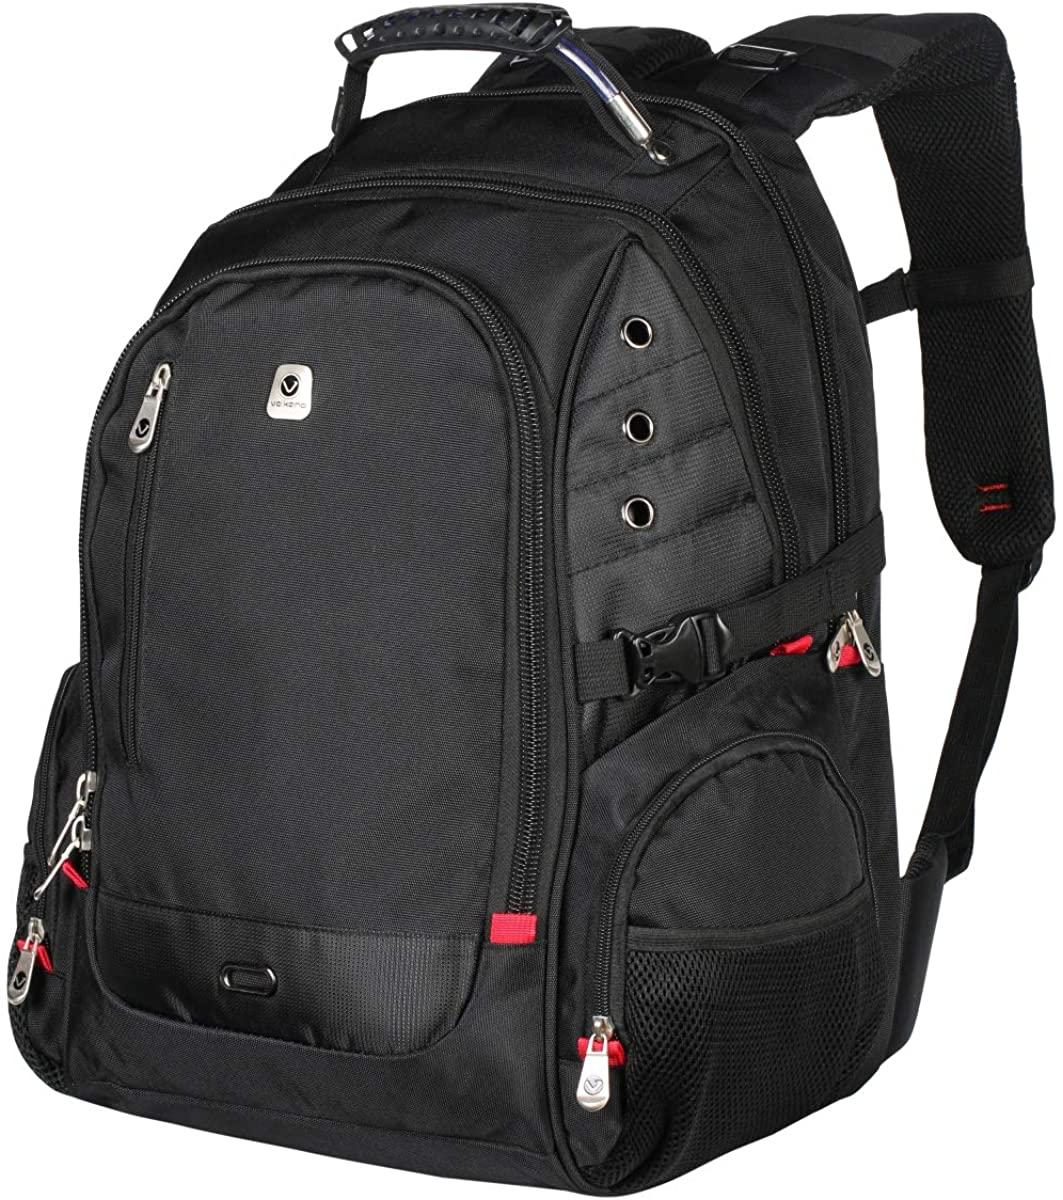 Volkano Tough Series Backpack